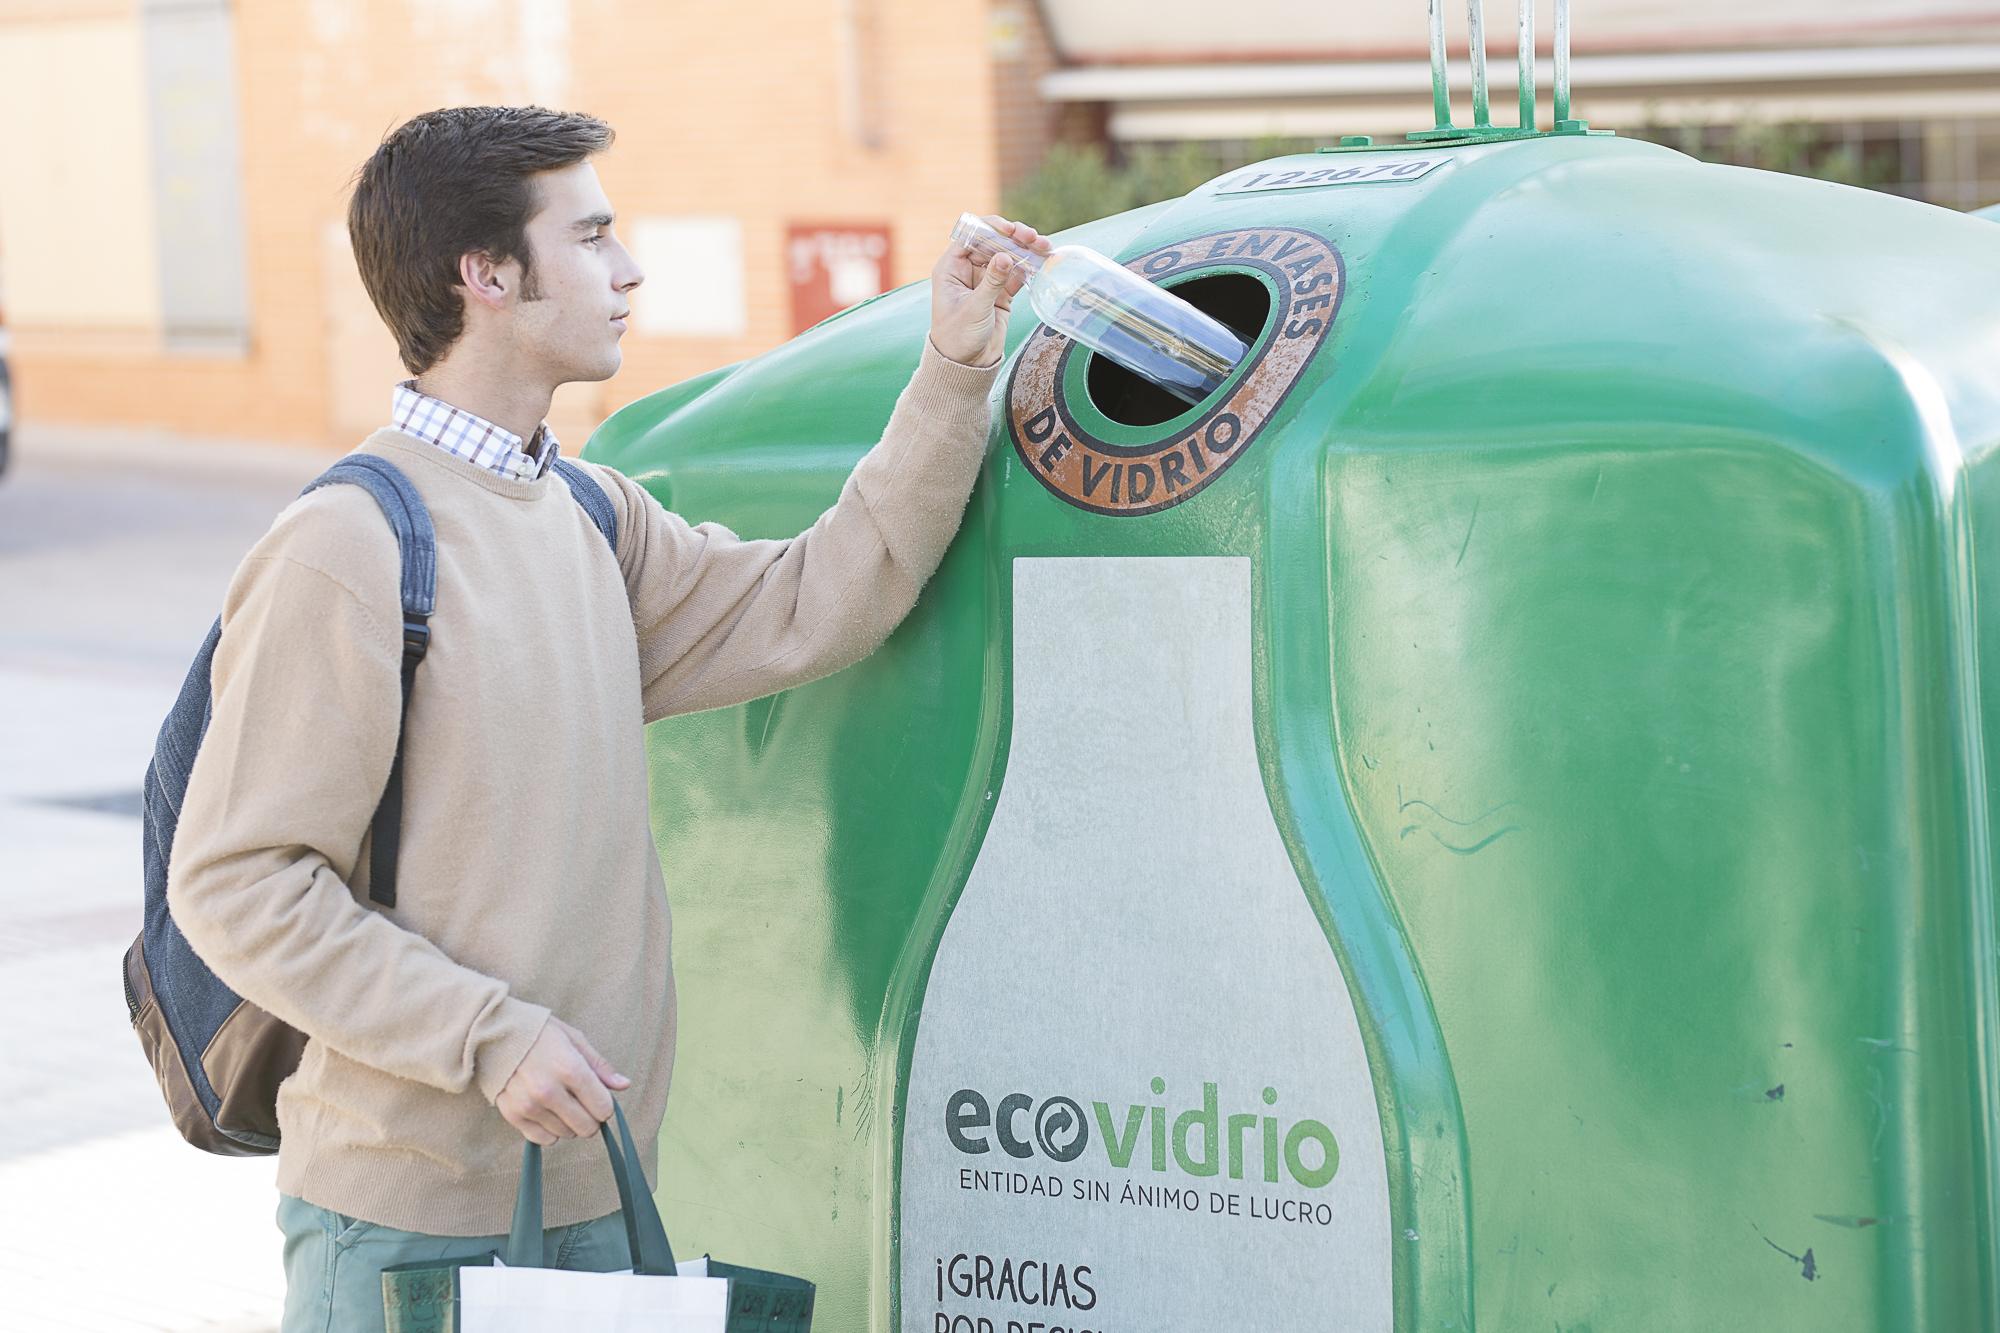 Ecovidrio_1.JPG